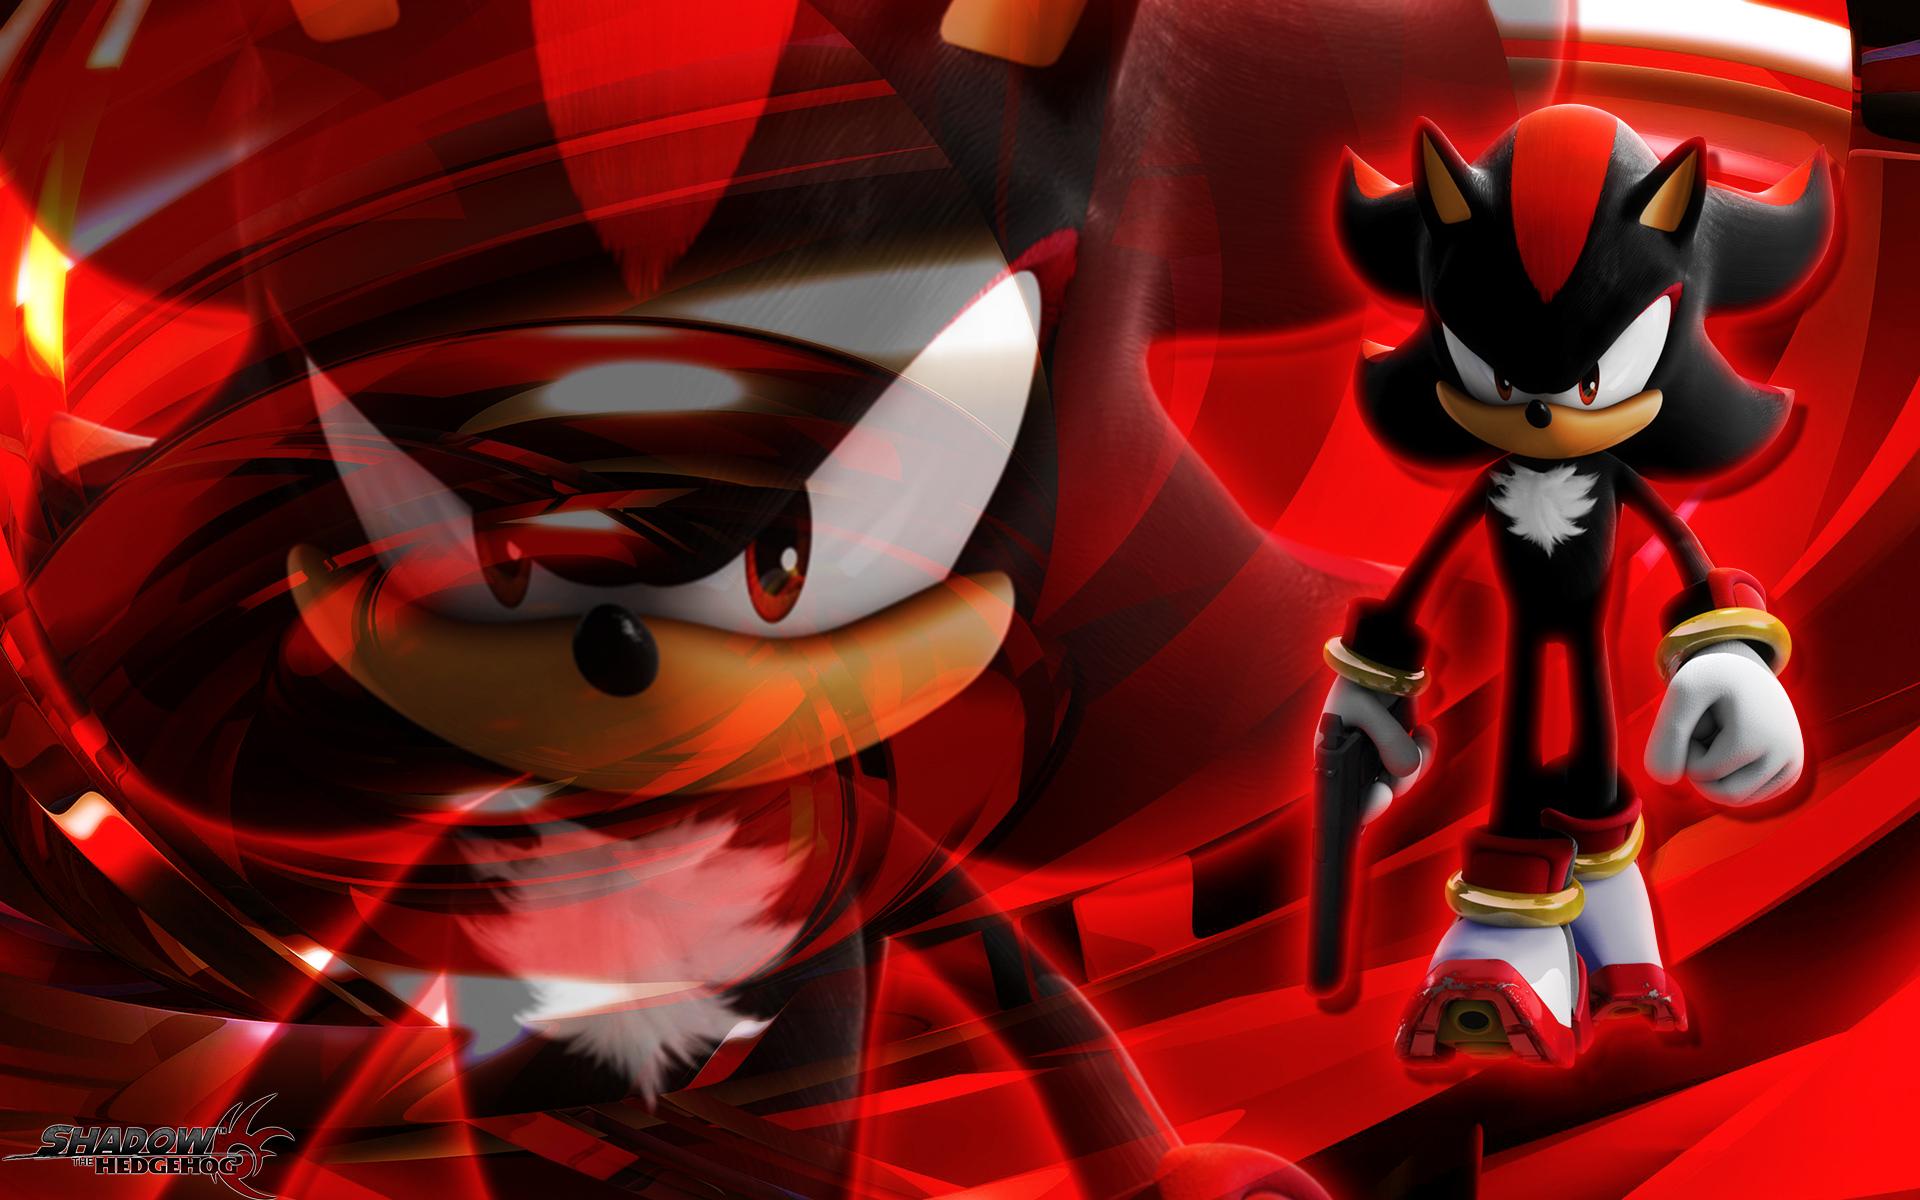 Shadow The Hedgehog Wallpaper By Sonicthehedgehogbg On Deviantart